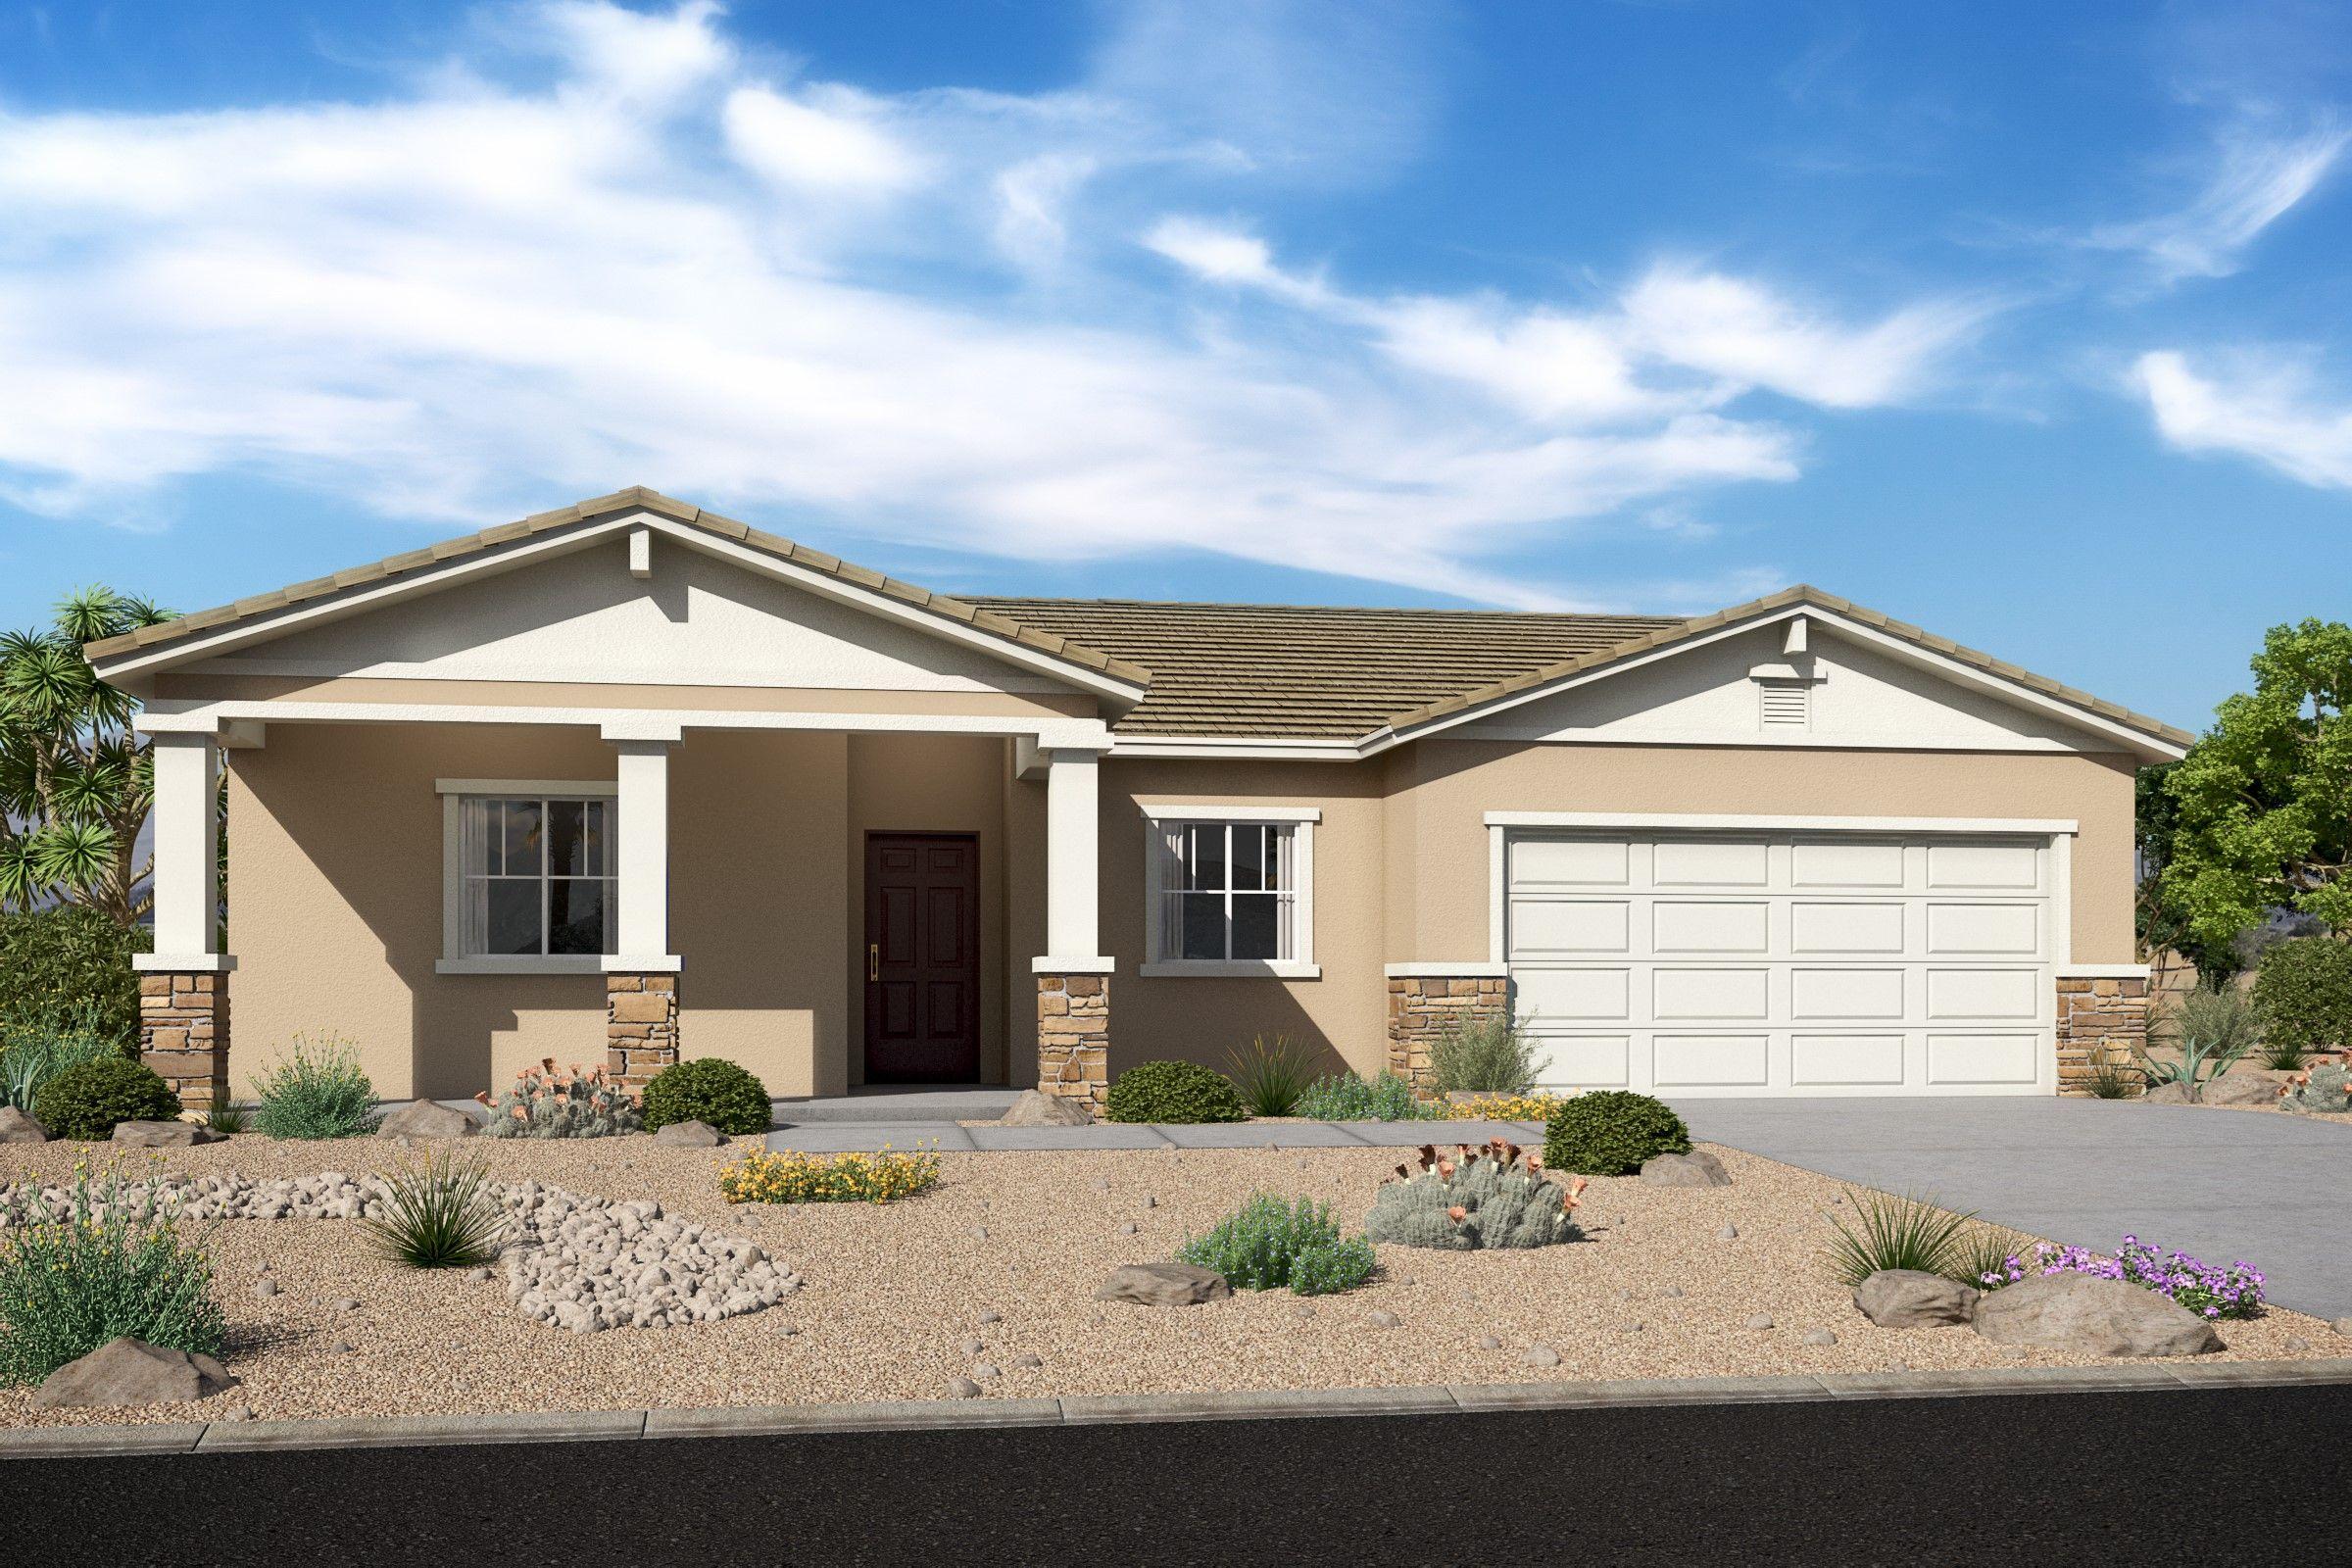 Single Family for Sale at Denali 329 East Atlantic Drive, Homesite 30 Casa Grande, Arizona 85122 United States